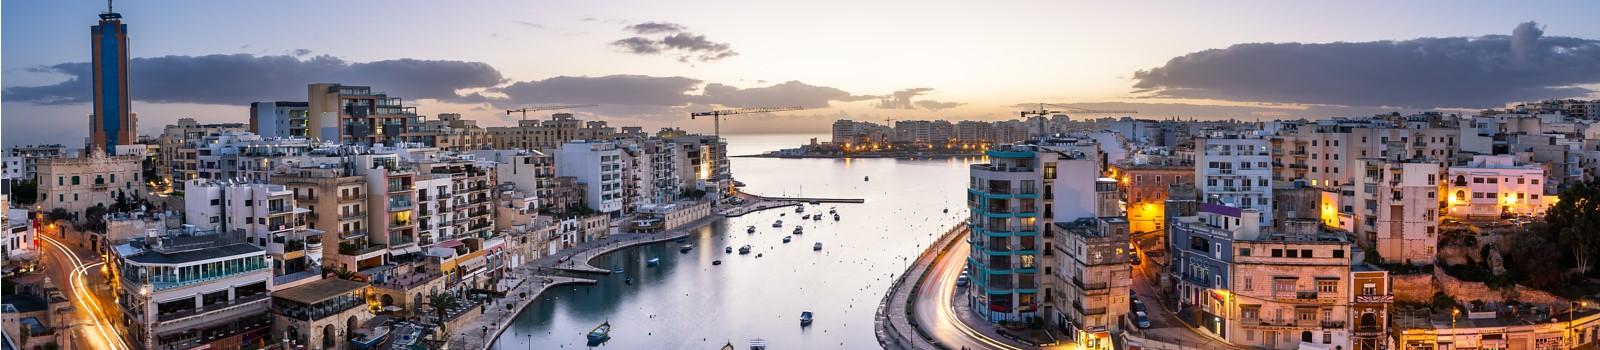 Water, Waterfront, Harbor